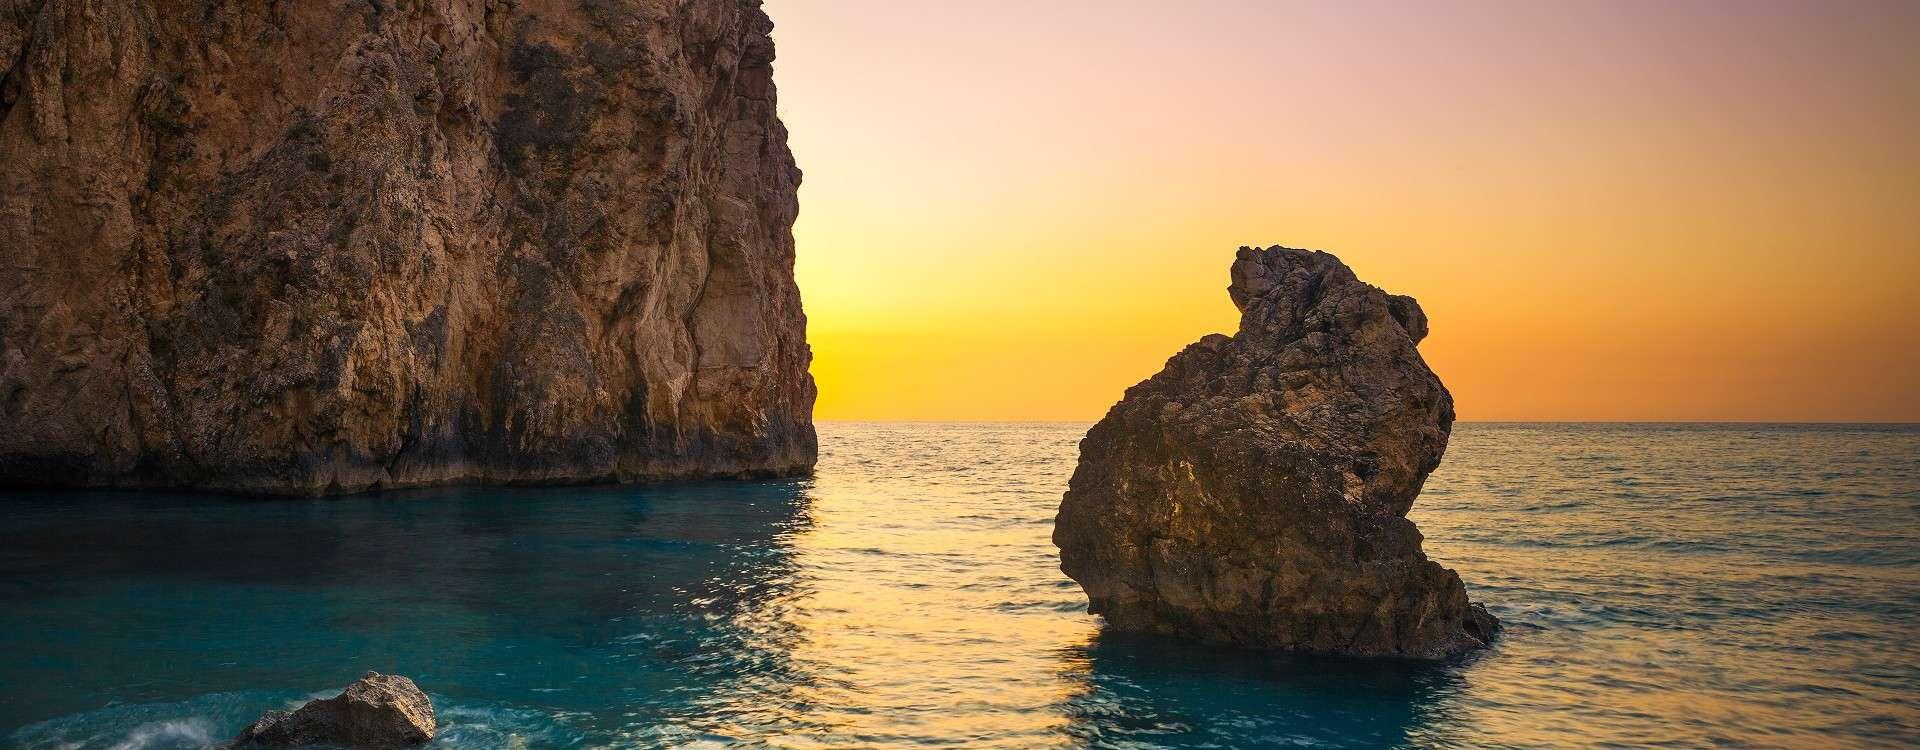 Sunset-at-Milos-Beach-in-Lefkada-Greece